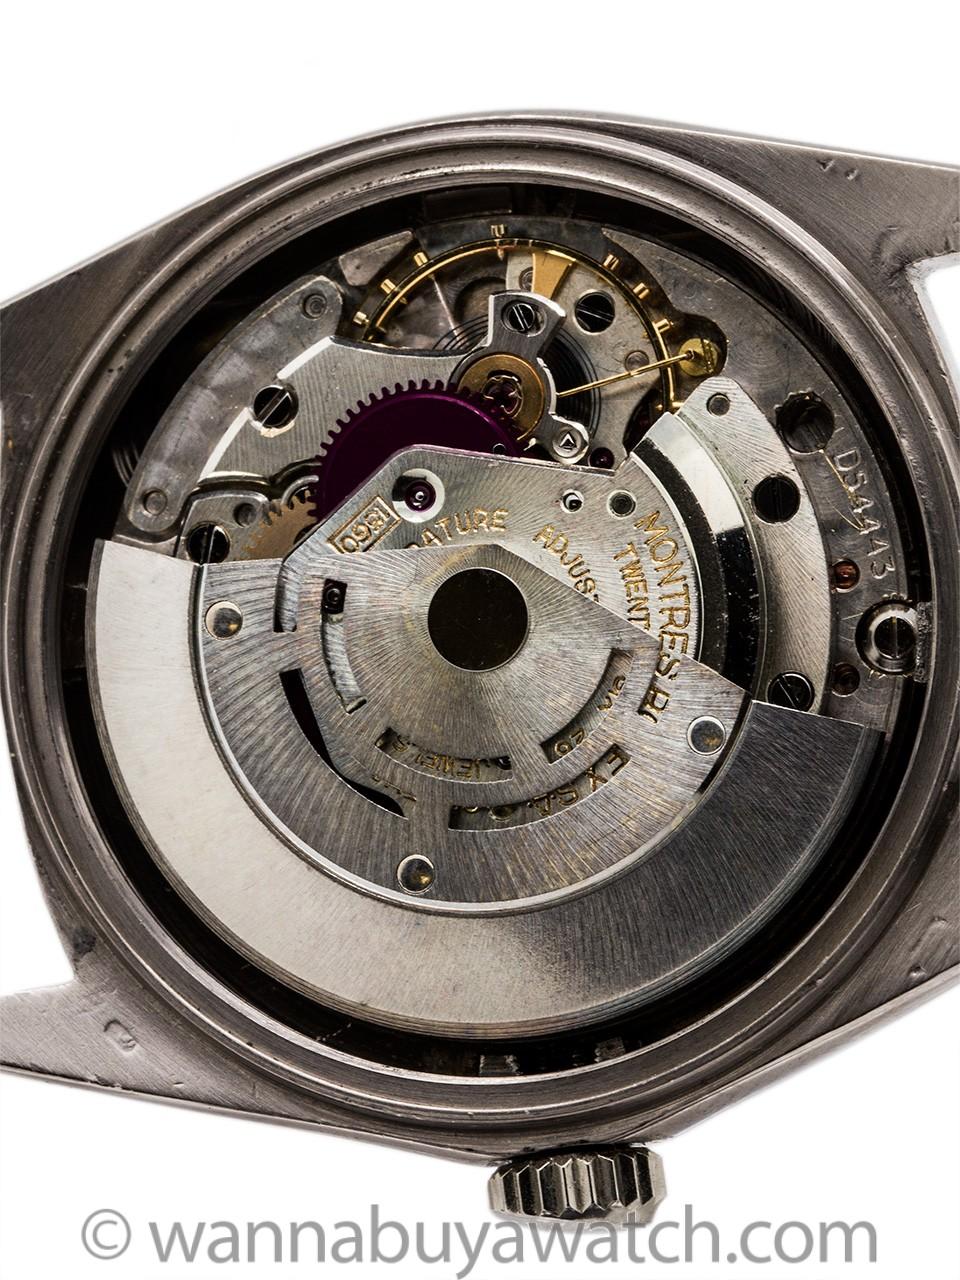 Rare Rolex Datejust ref 1601 18K White Gold Black Pie Pan Dial circa 1963